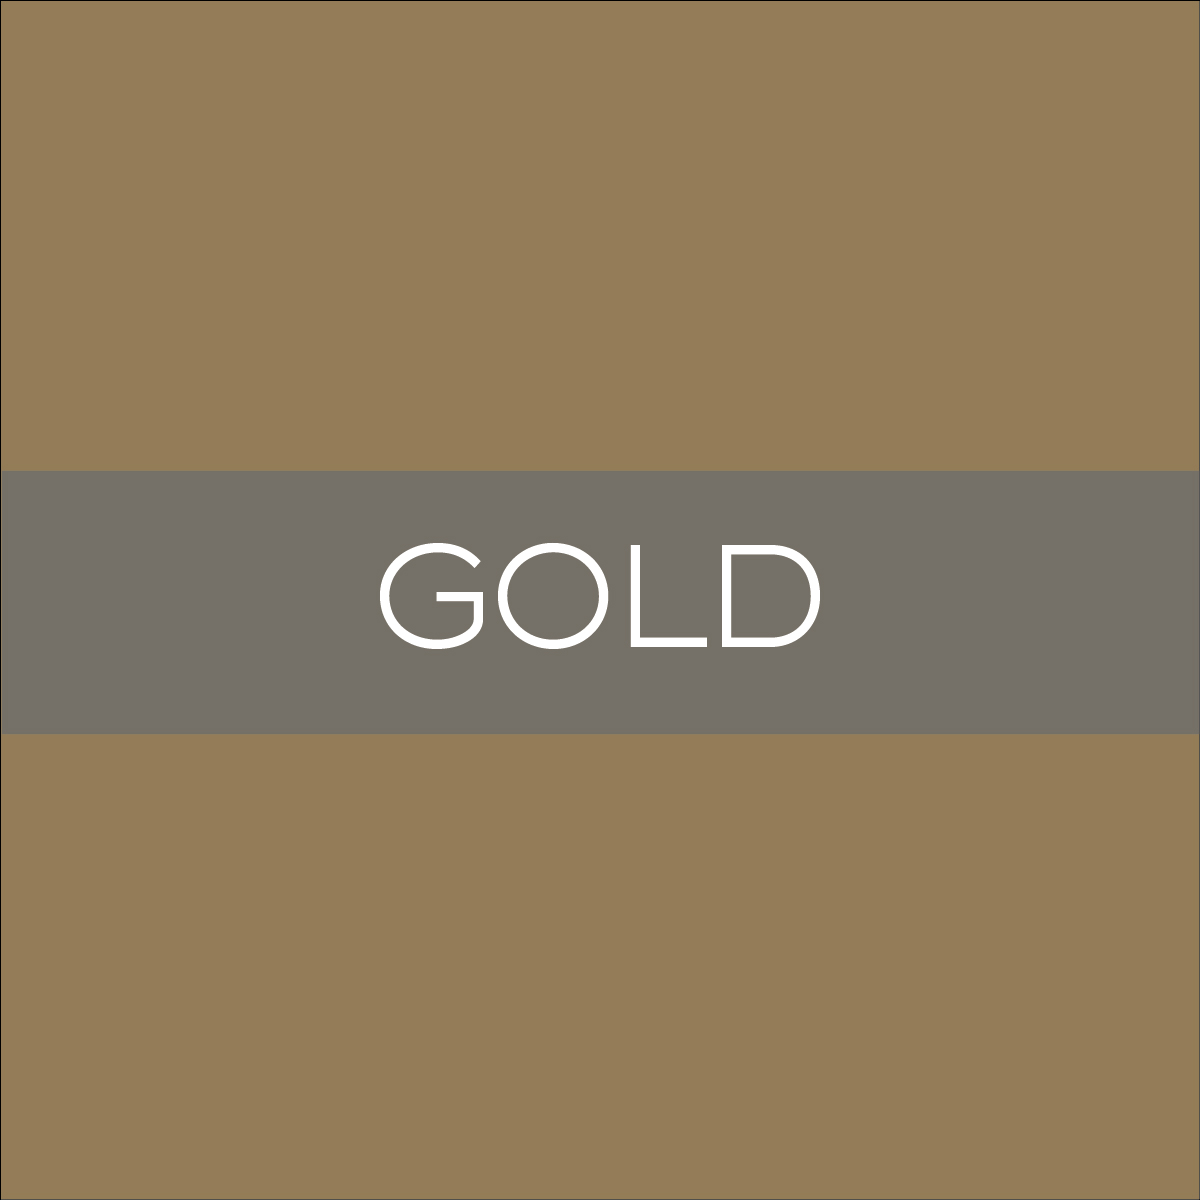 INK_Gold.jpg